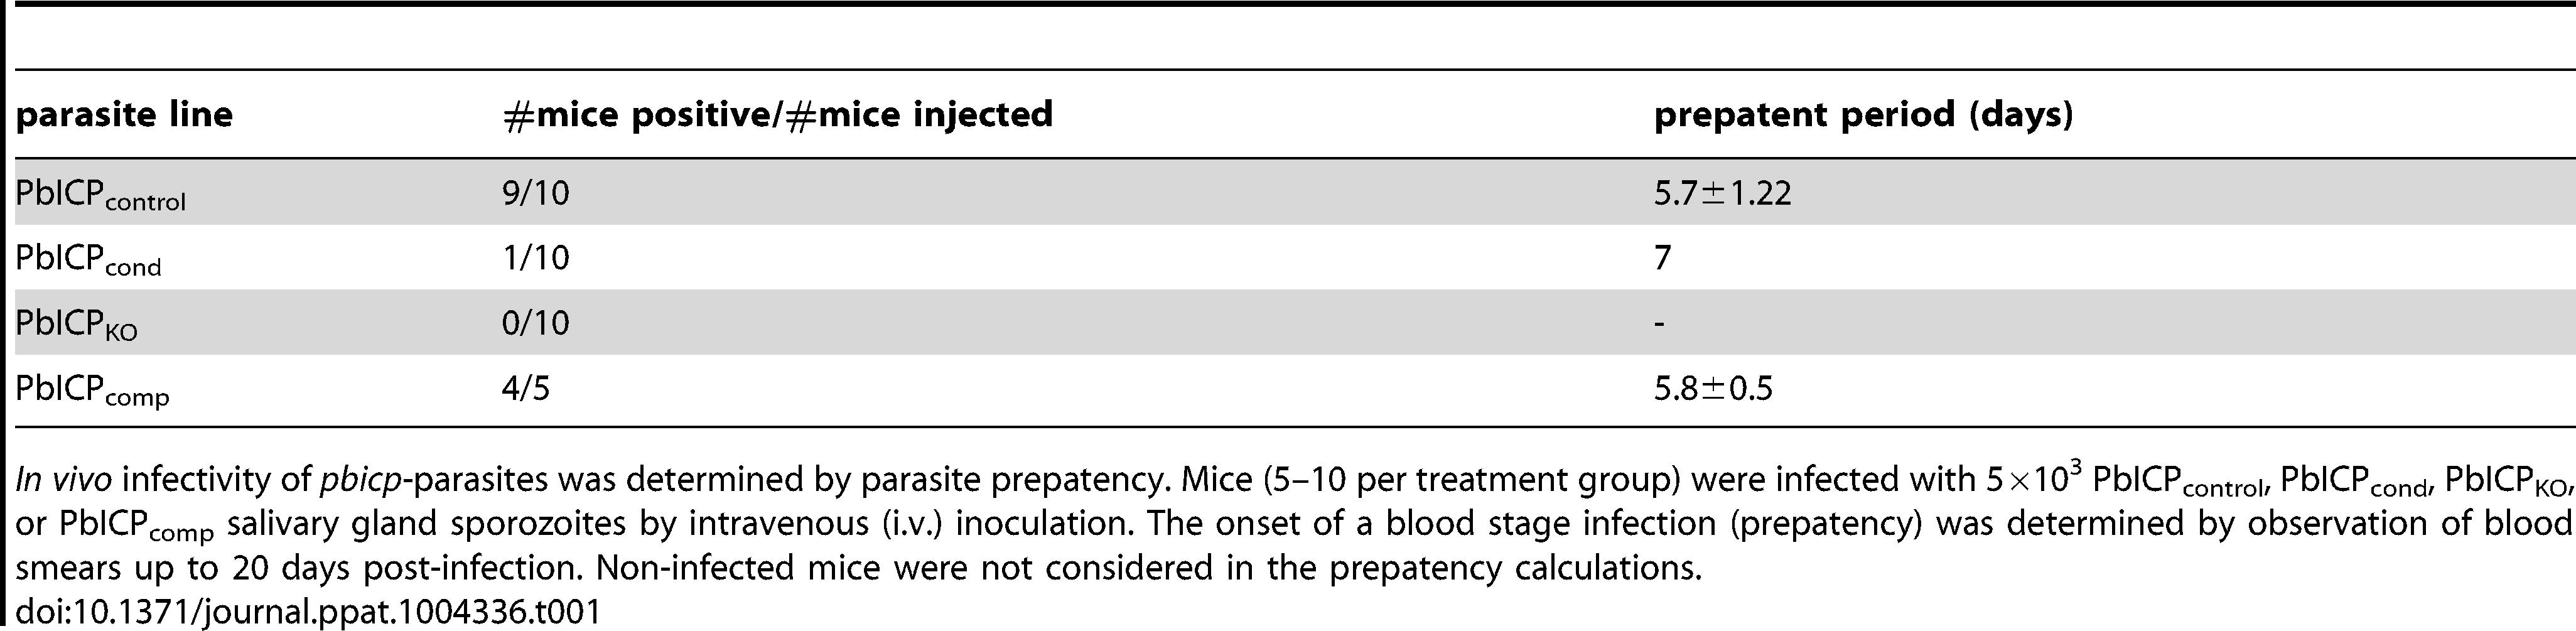 PbICP is essential for parasite development <i>in vivo</i>.